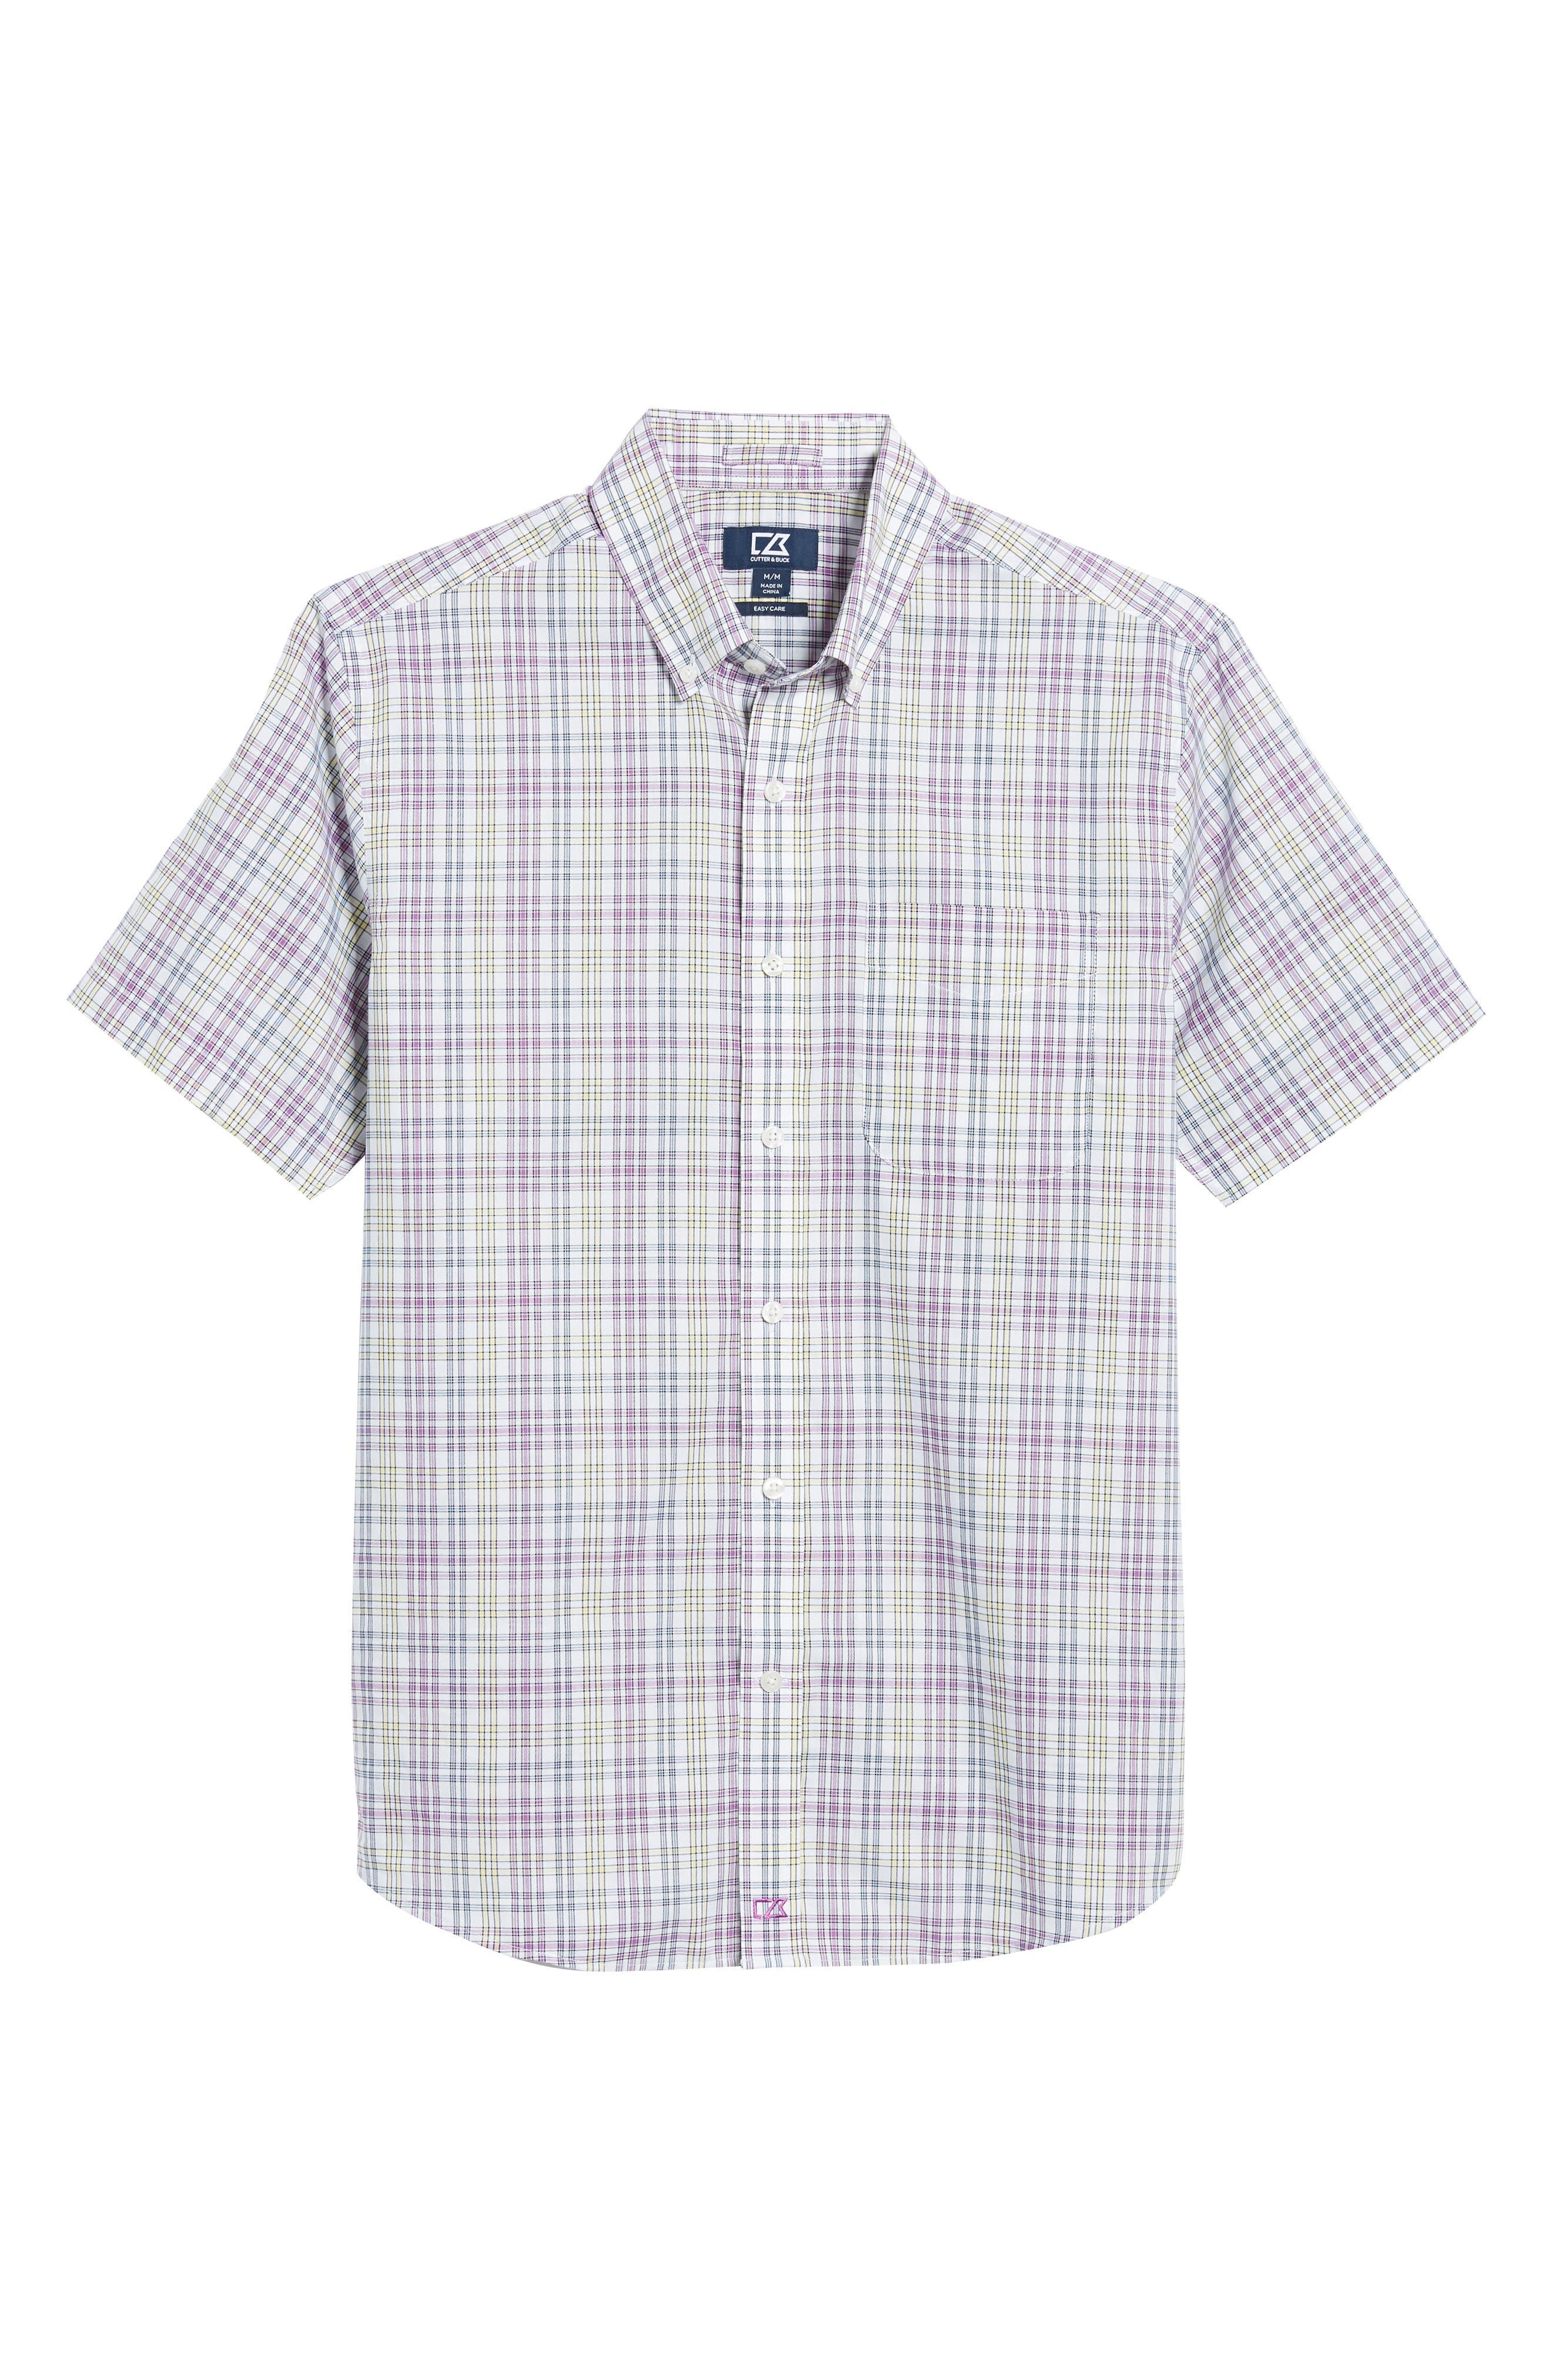 Isaac Plaid Easy Care Woven Shirt,                             Alternate thumbnail 24, color,